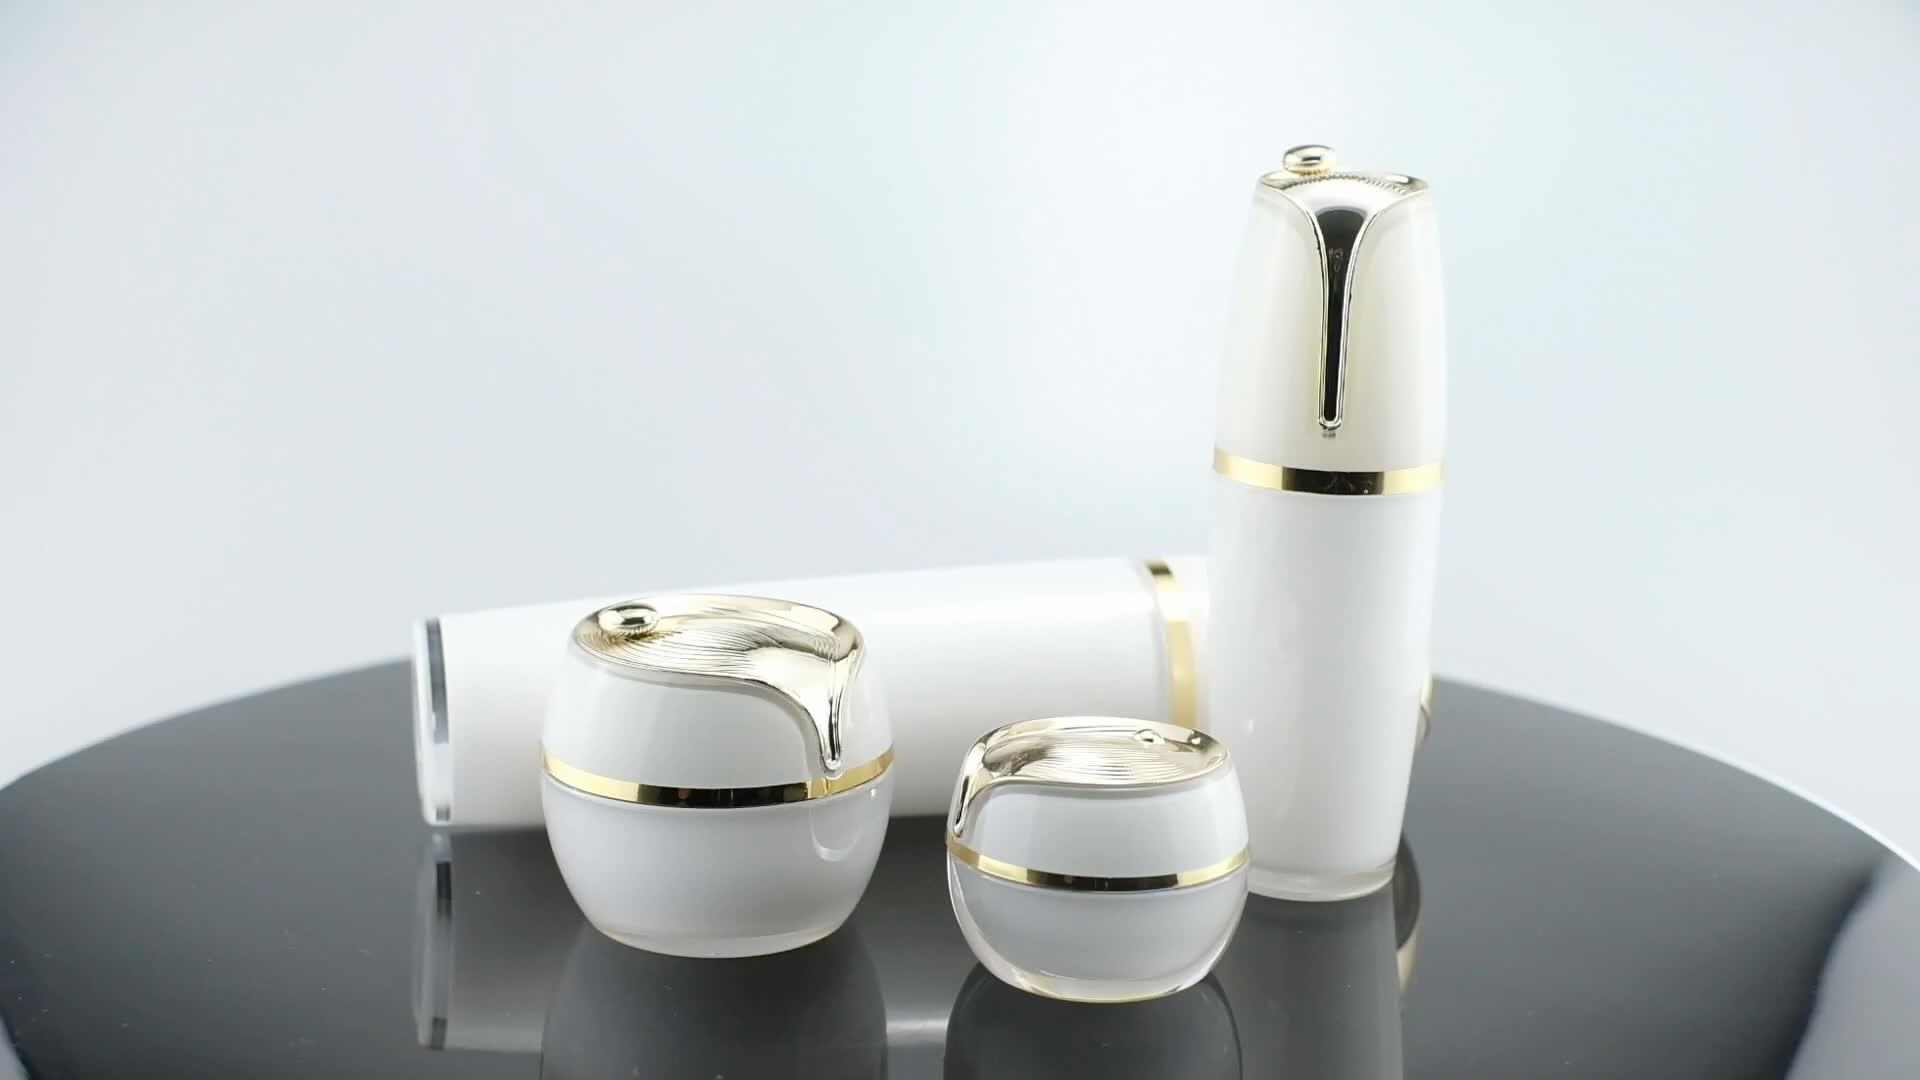 (Jar-5/10/15/20/30g)(Bottle-20/30/80ml) customizable luxury skin care acrylic cream jar packaging & emulsion bottles set